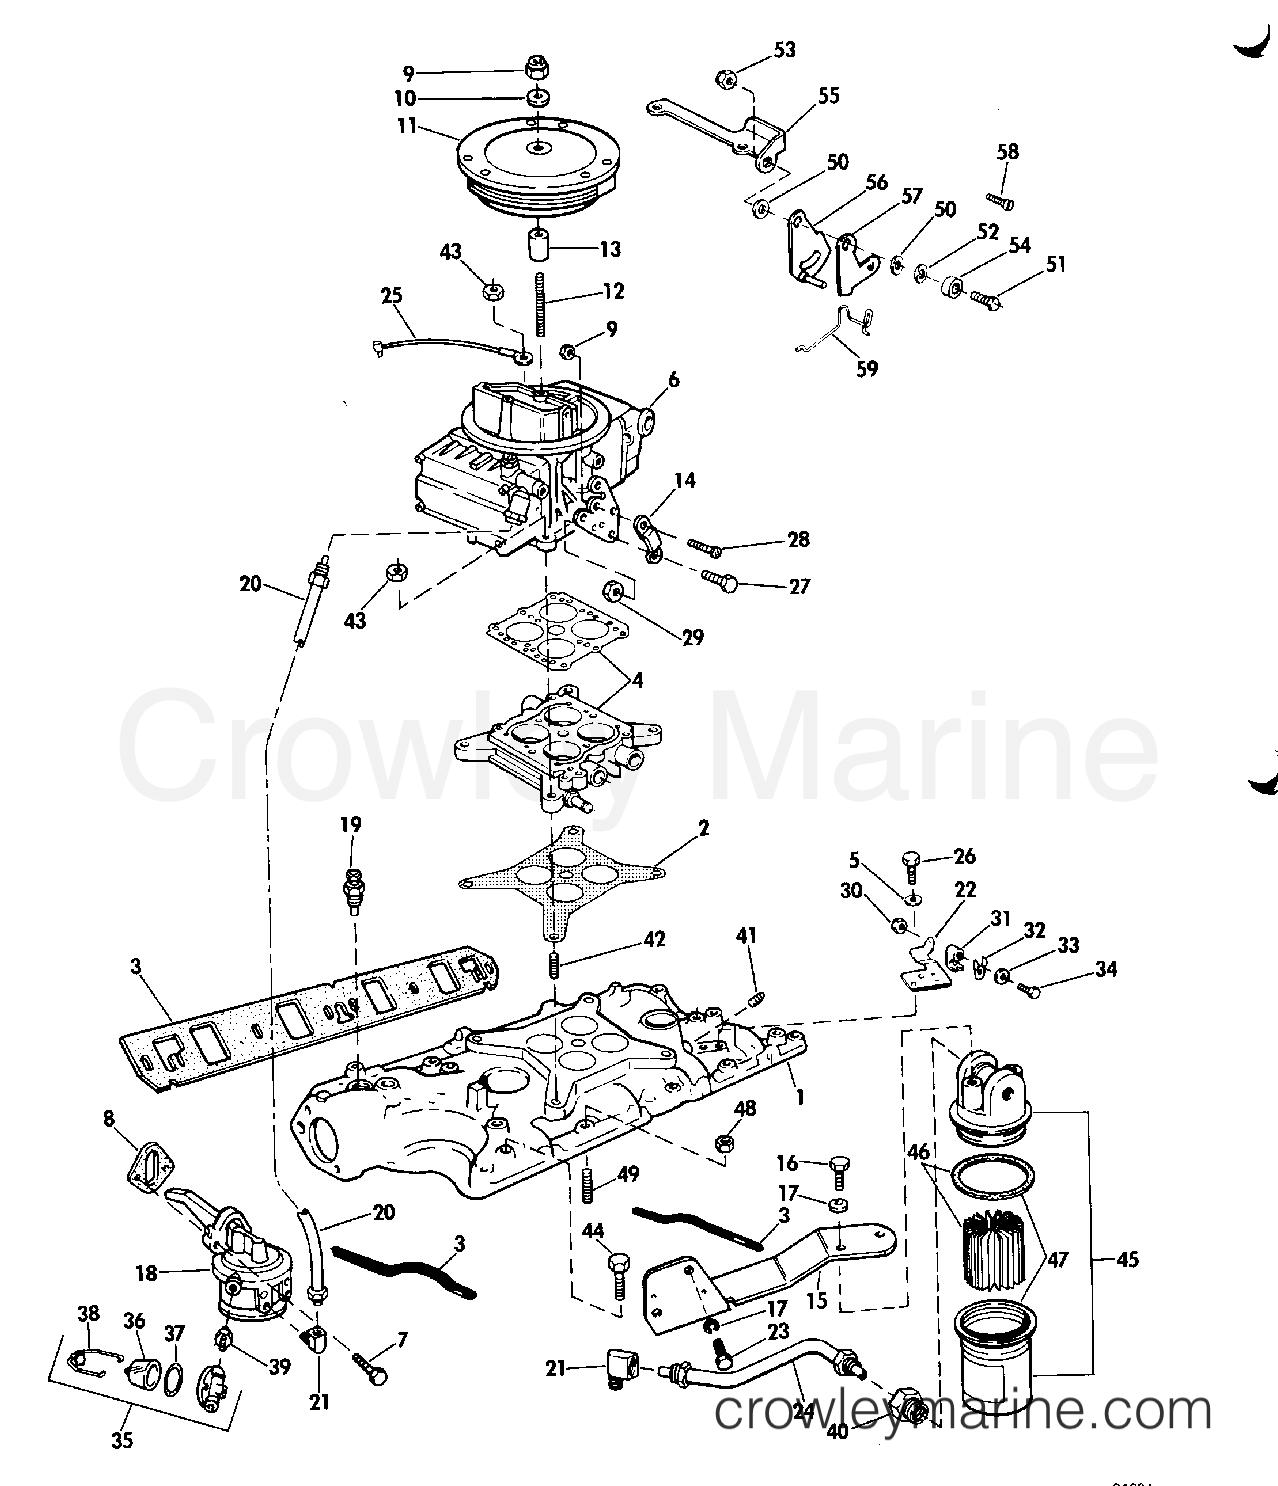 Intake Manifold Fuel Pump Amp Carburetor Lines 250 Model